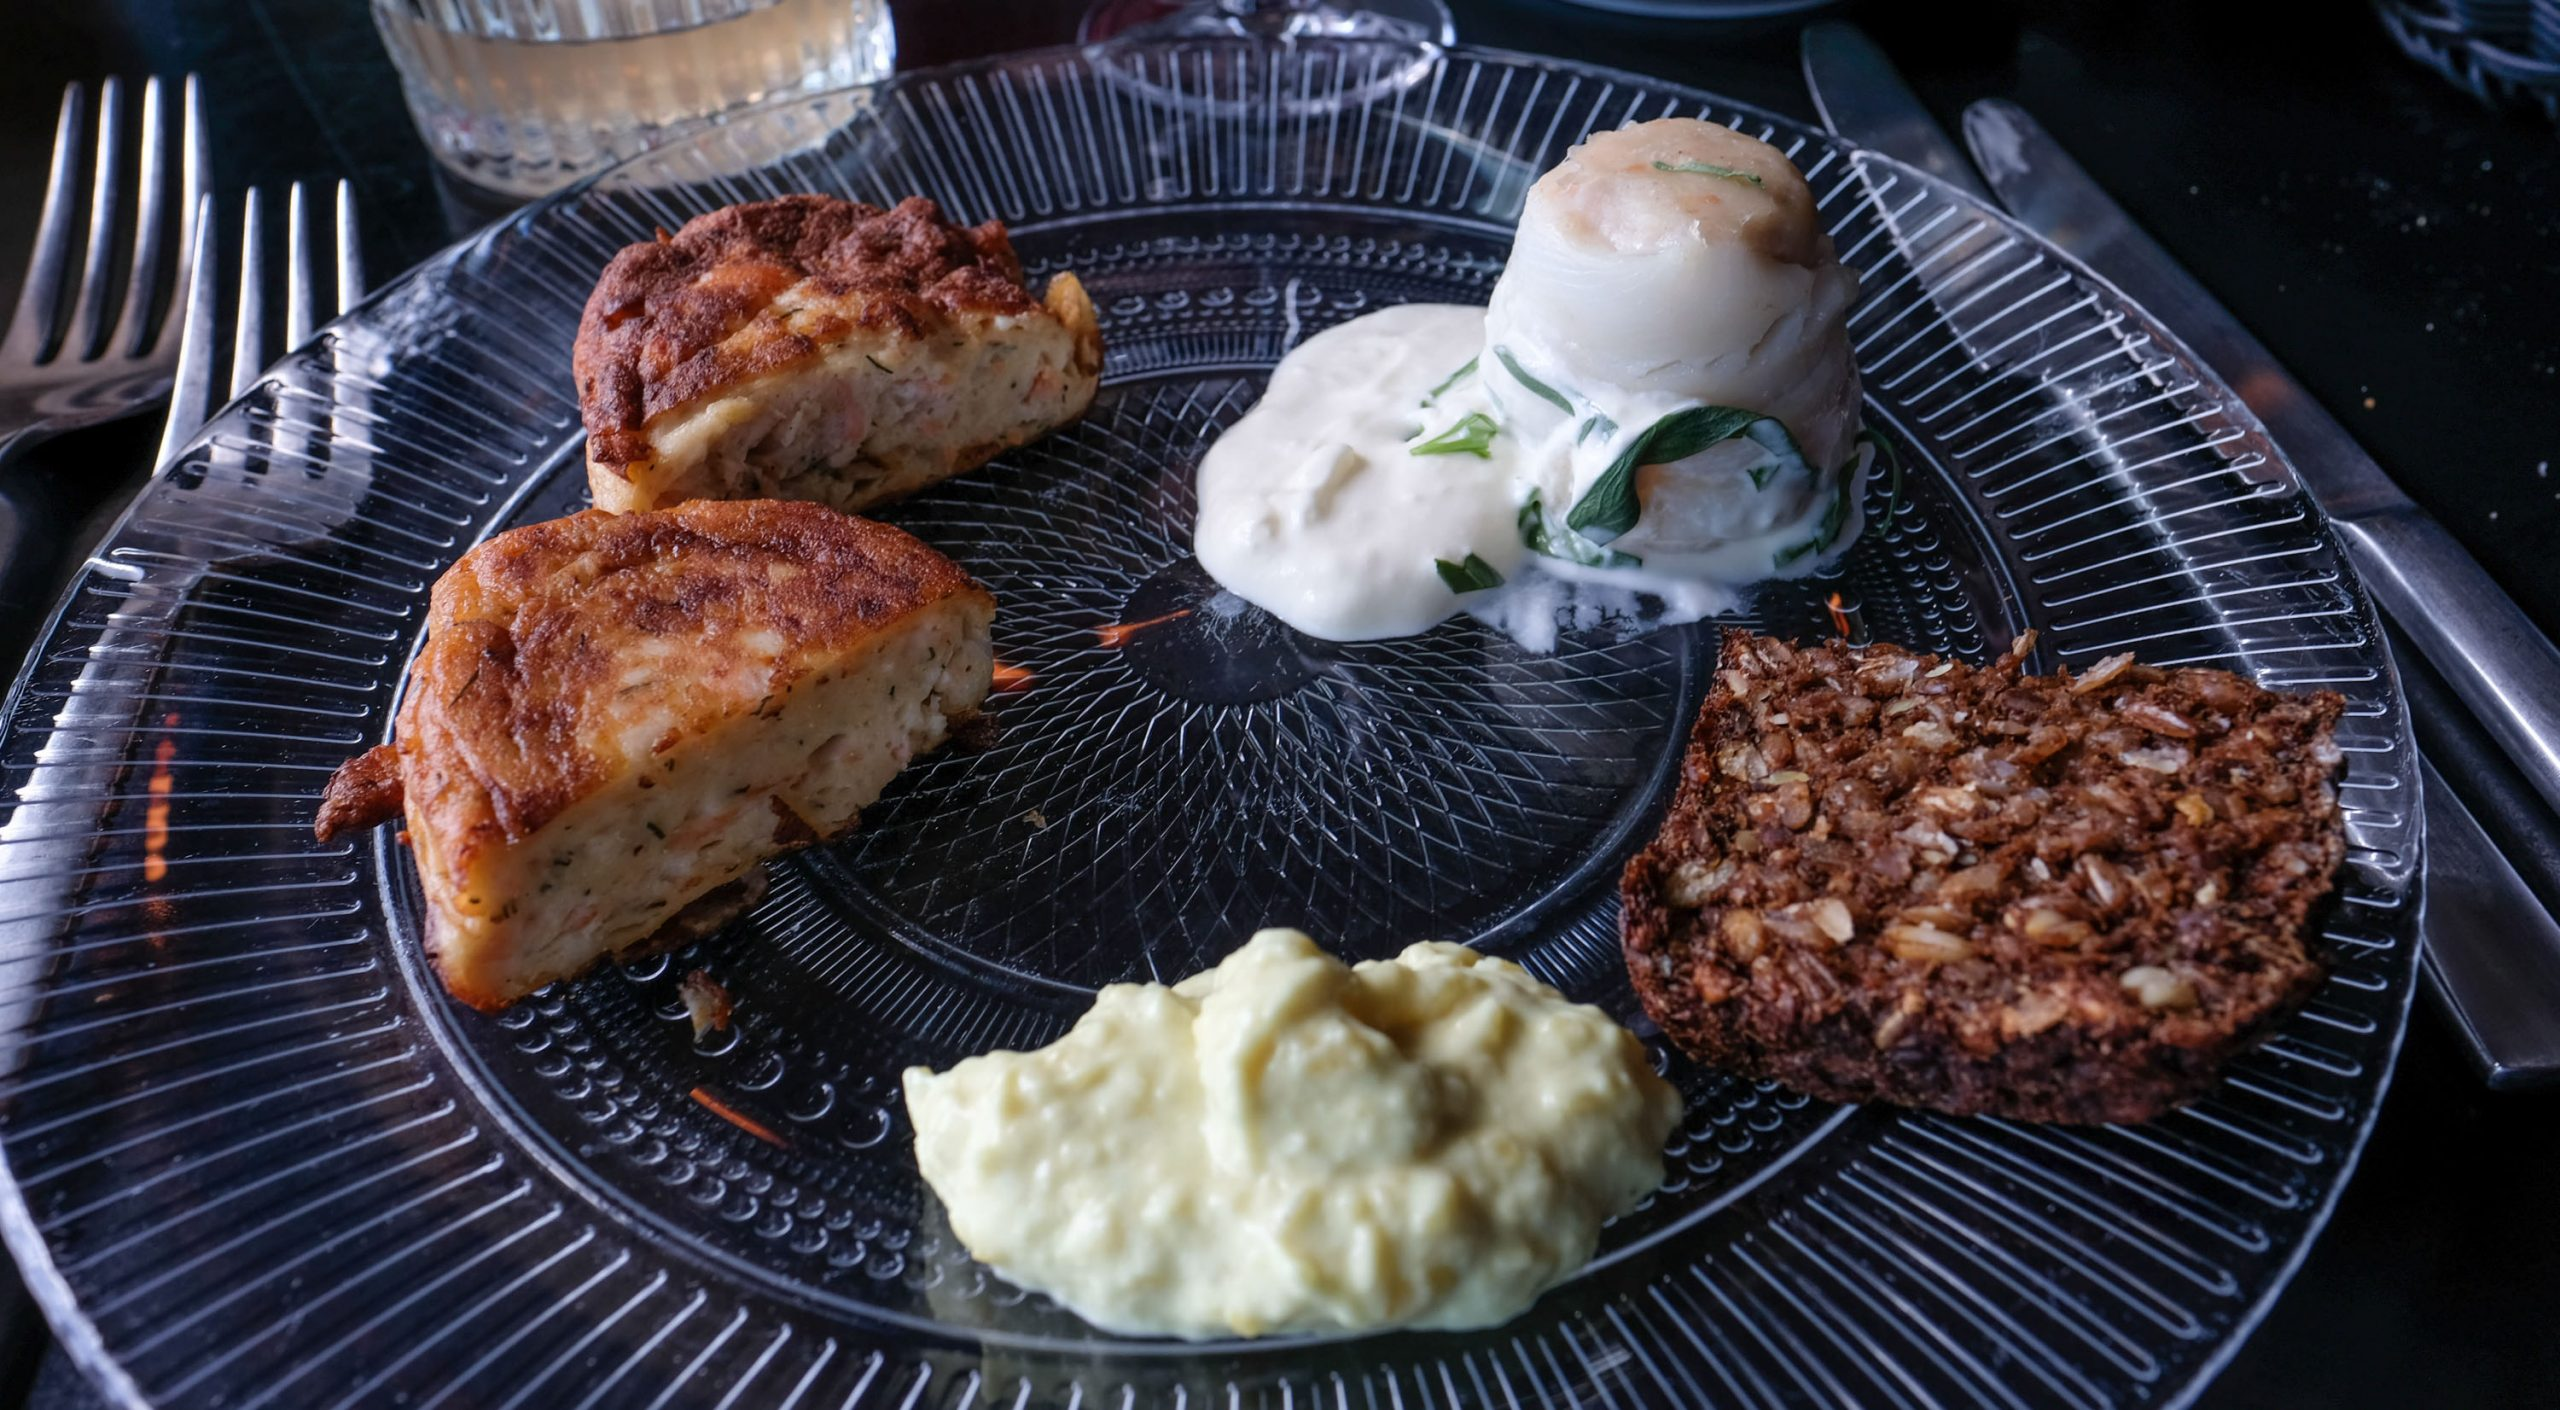 Den perfekte start på dagen: Kald det, hvad du vil; mokost, brunch eller weekend-frokost på havnen